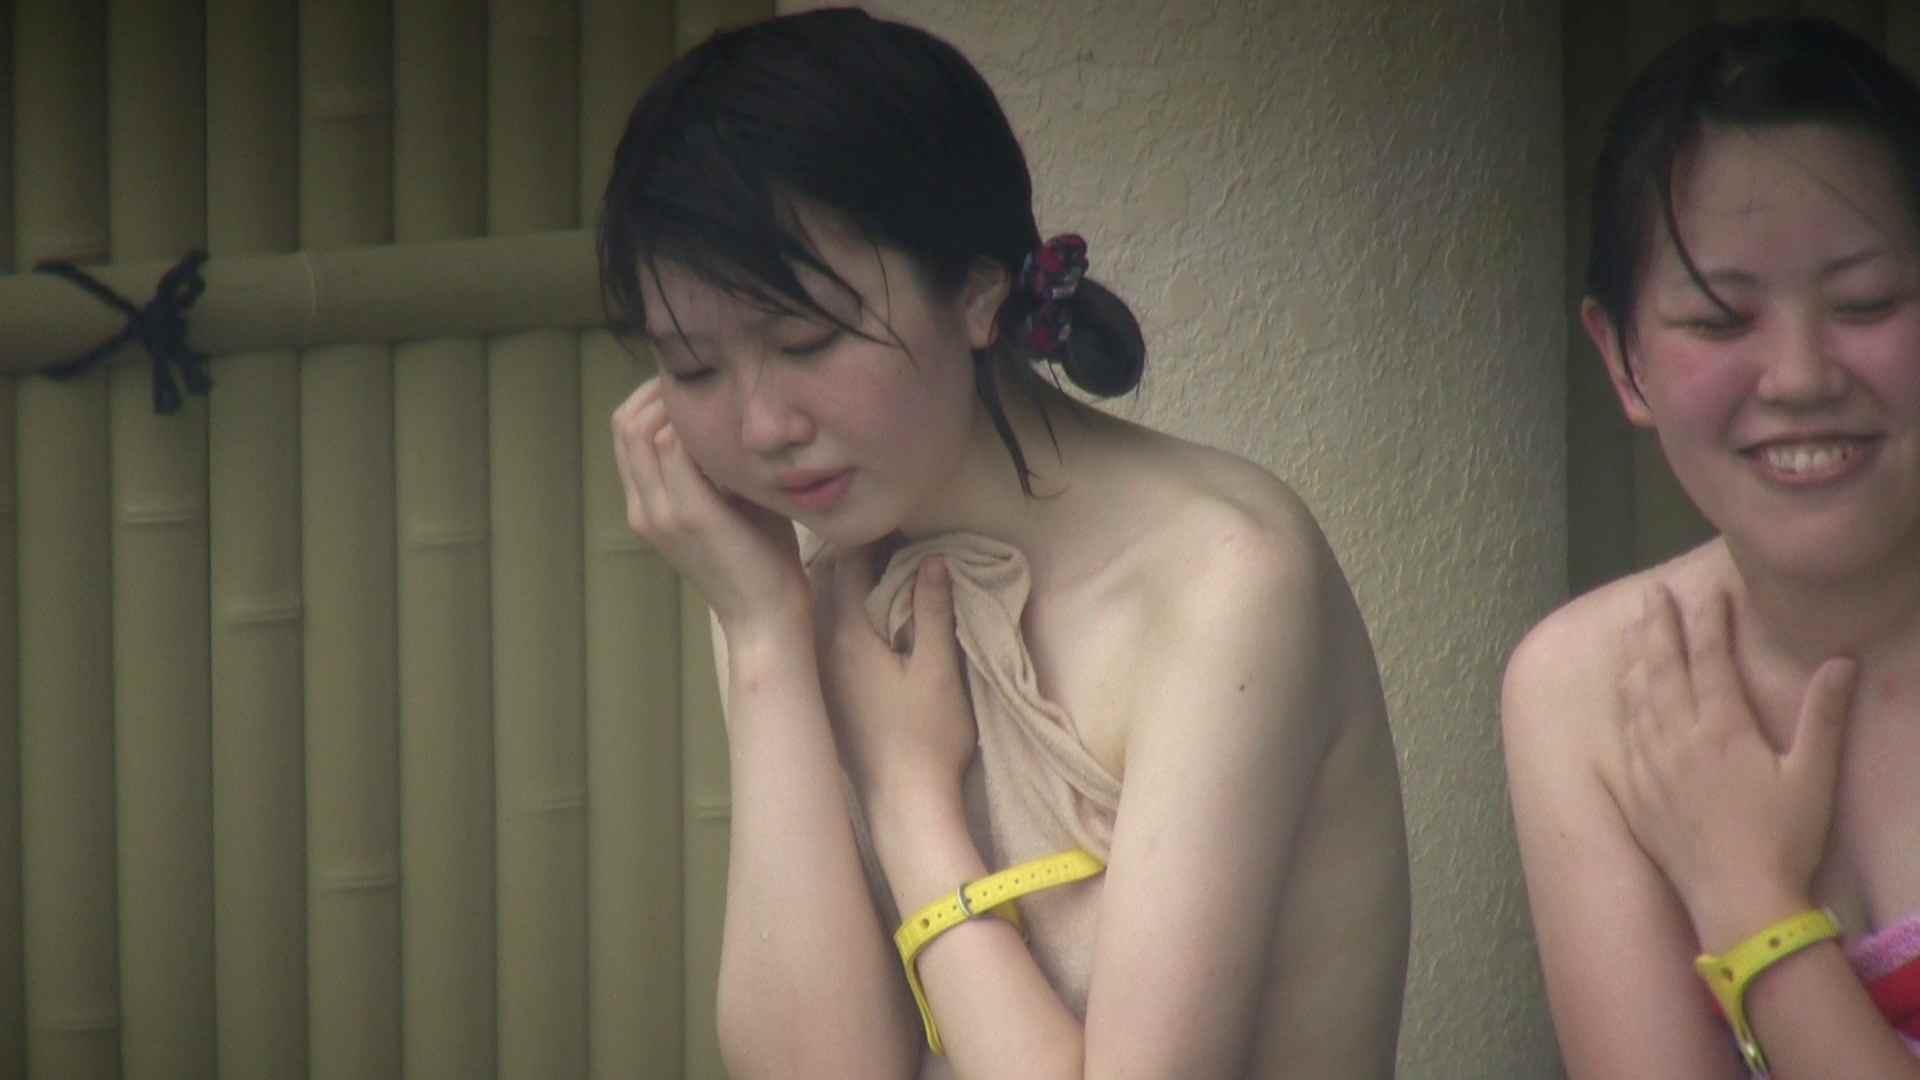 Aquaな露天風呂Vol.128 盗撮 | HなOL  51pic 11